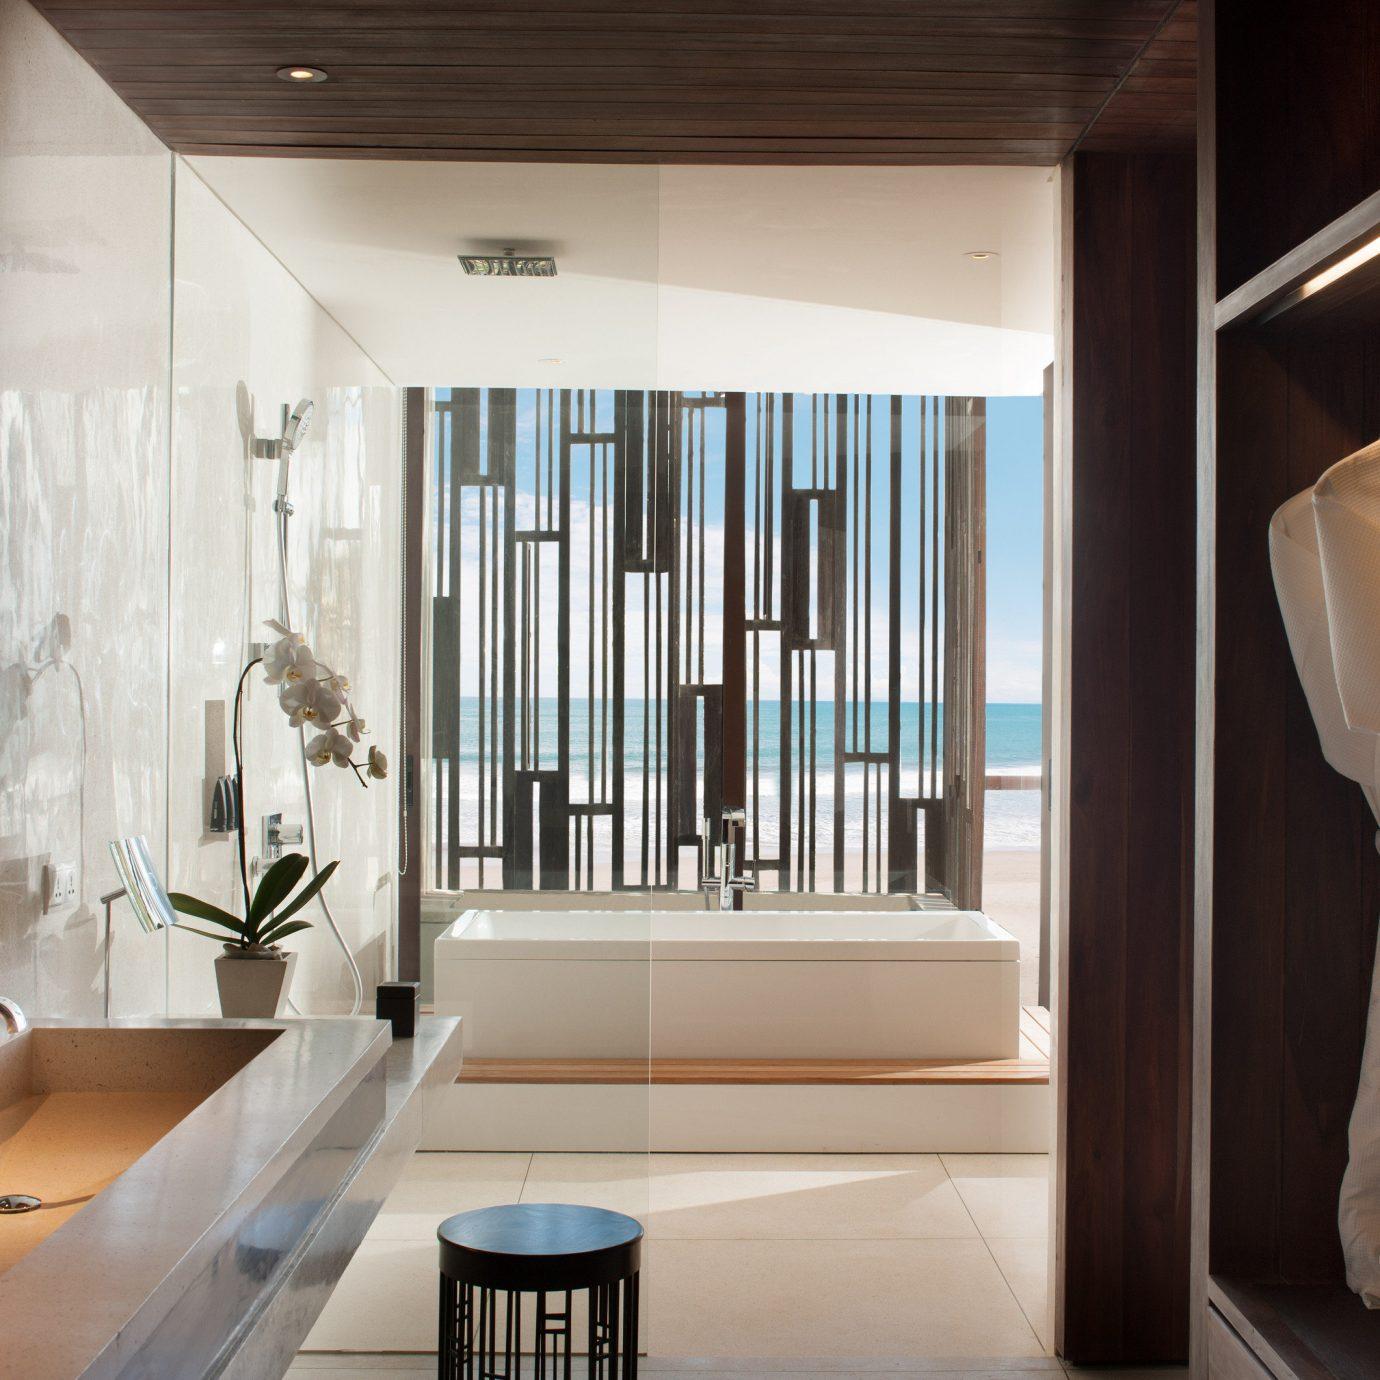 Architecture home lighting hall living room Modern tub bathtub